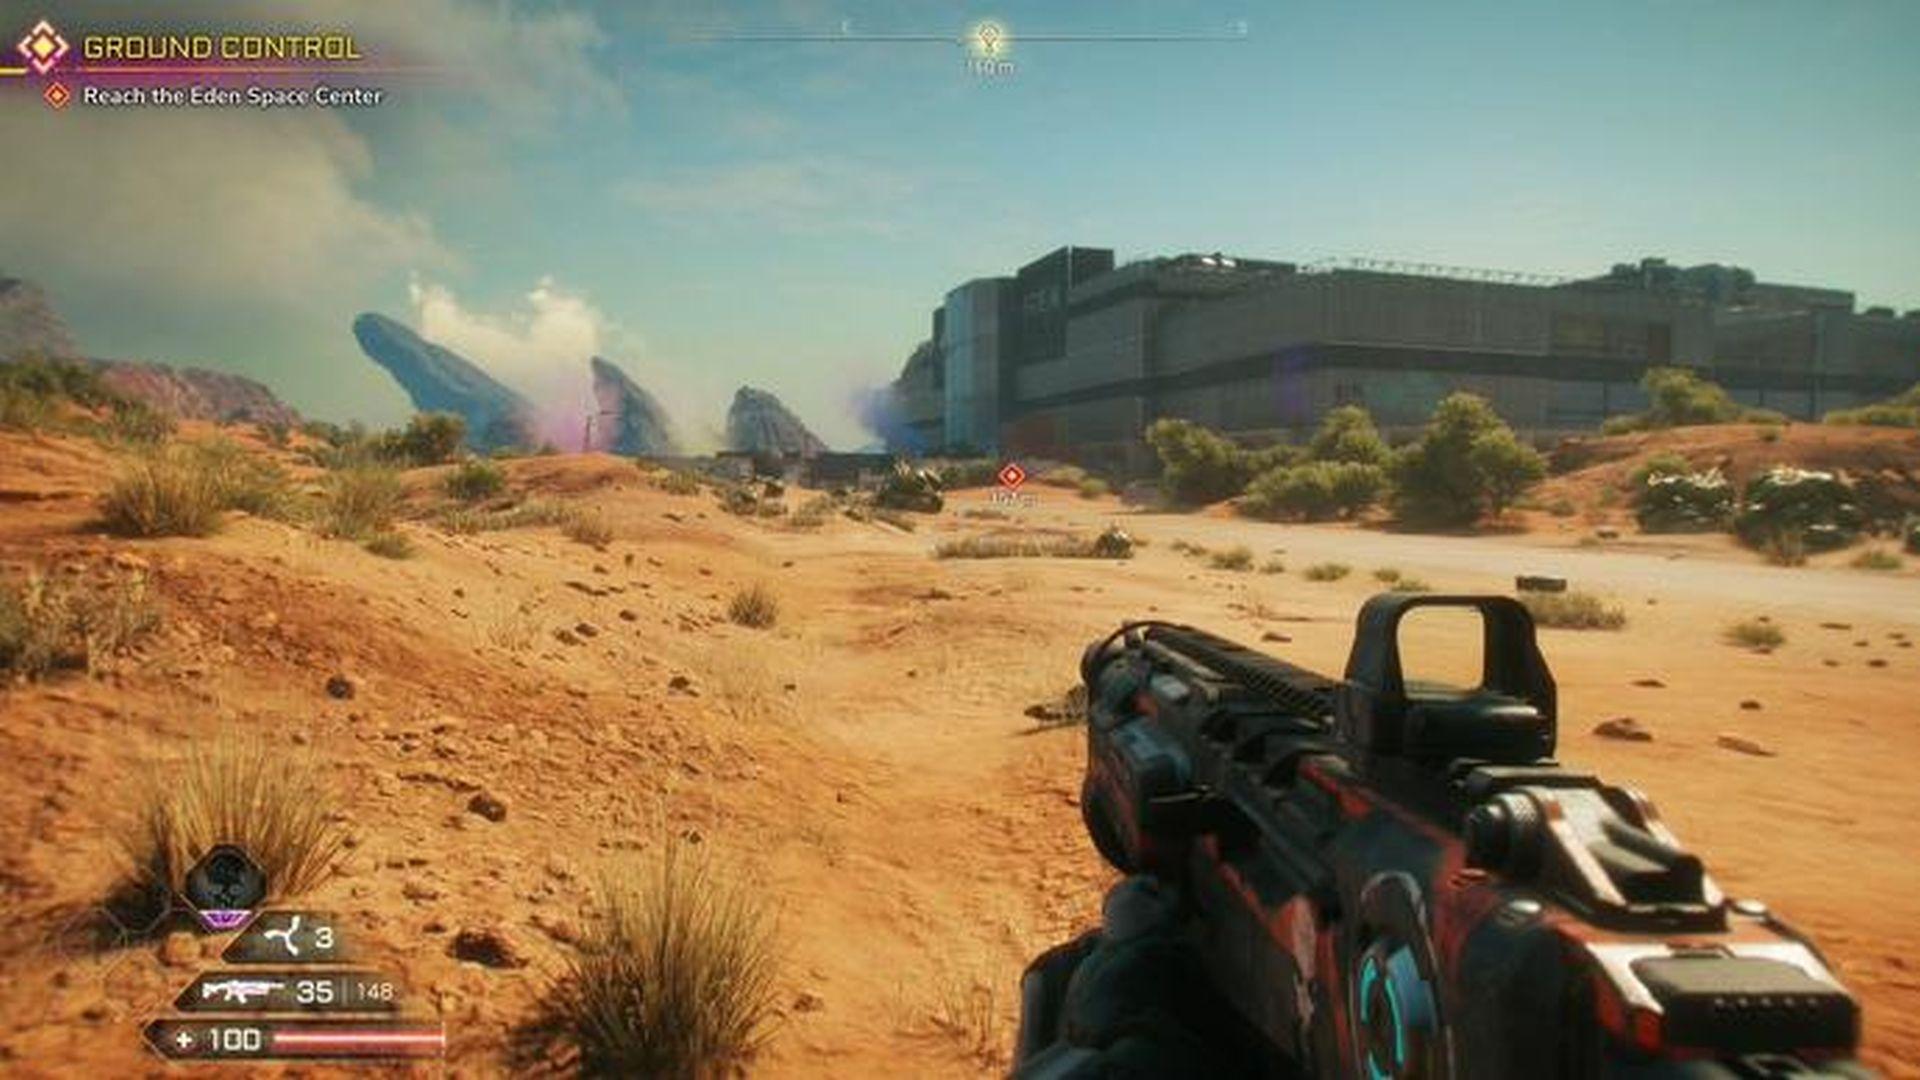 Rage 2--a first-person shooter, but a different beast than Doom Eternal.